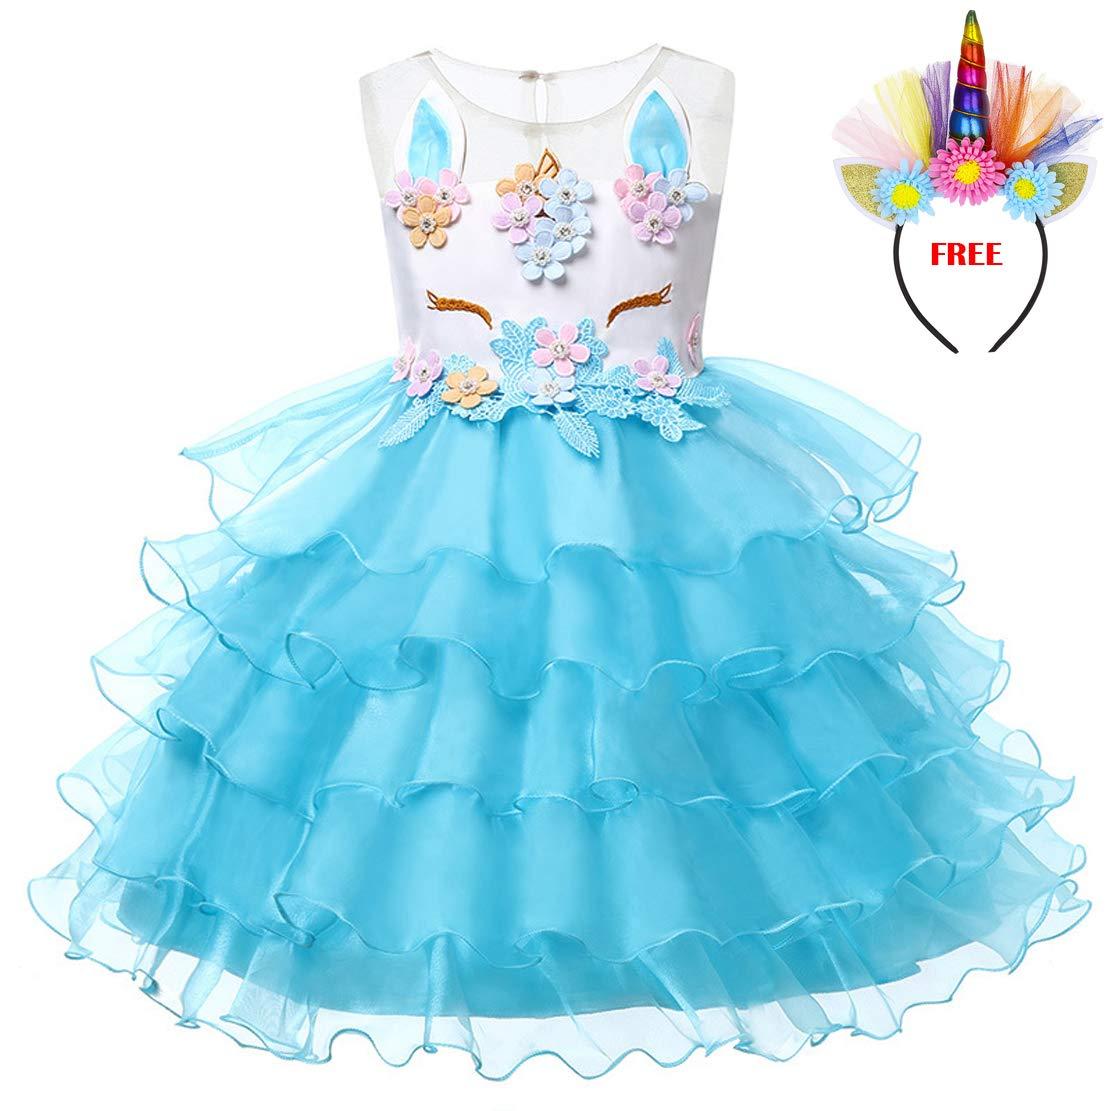 e70ccccee Lemonbaby My Little Pony Sleeveless Princess Birthday Party Dress Clothing